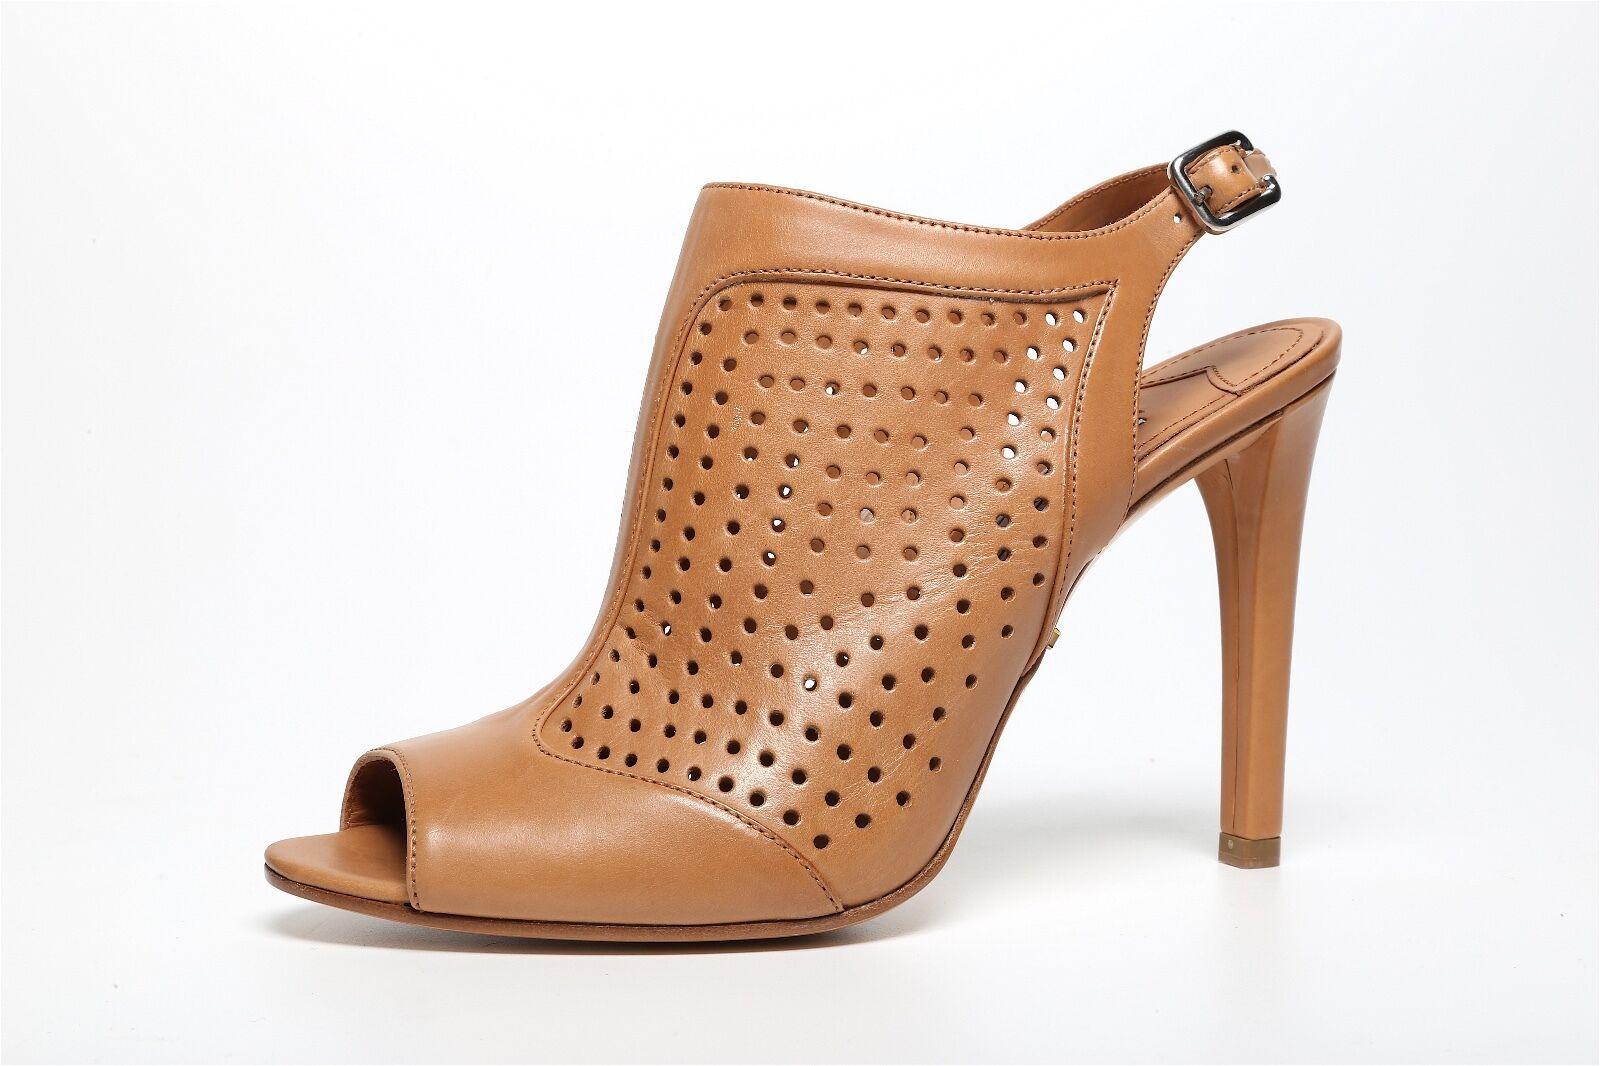 Prada Women's Brown Leather Perforated Peep Toe Bootie 2899 2899 2899 Sz 38 EUR f4fa03